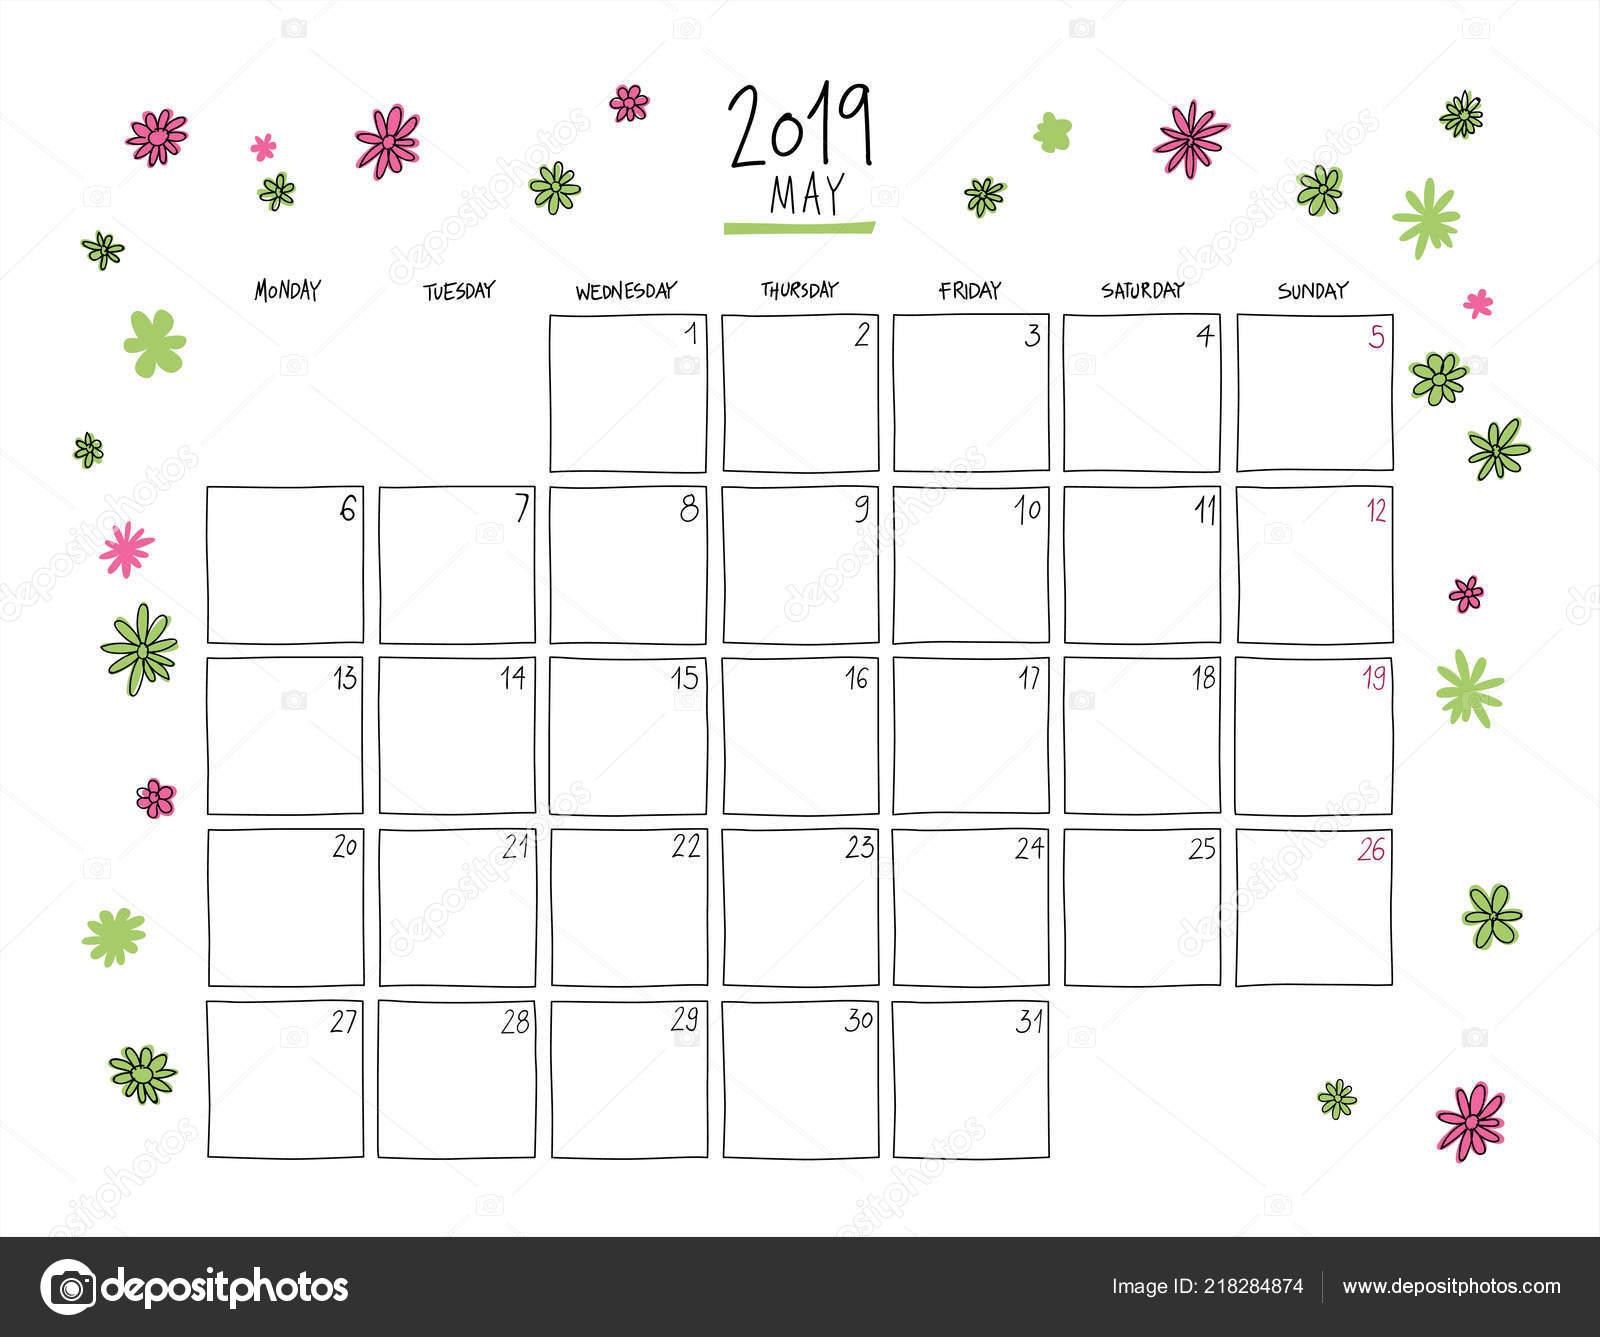 03fcd6731 Calendario de pared de mayo de 2019. Plantilla horizontal de dibujo  colorido.